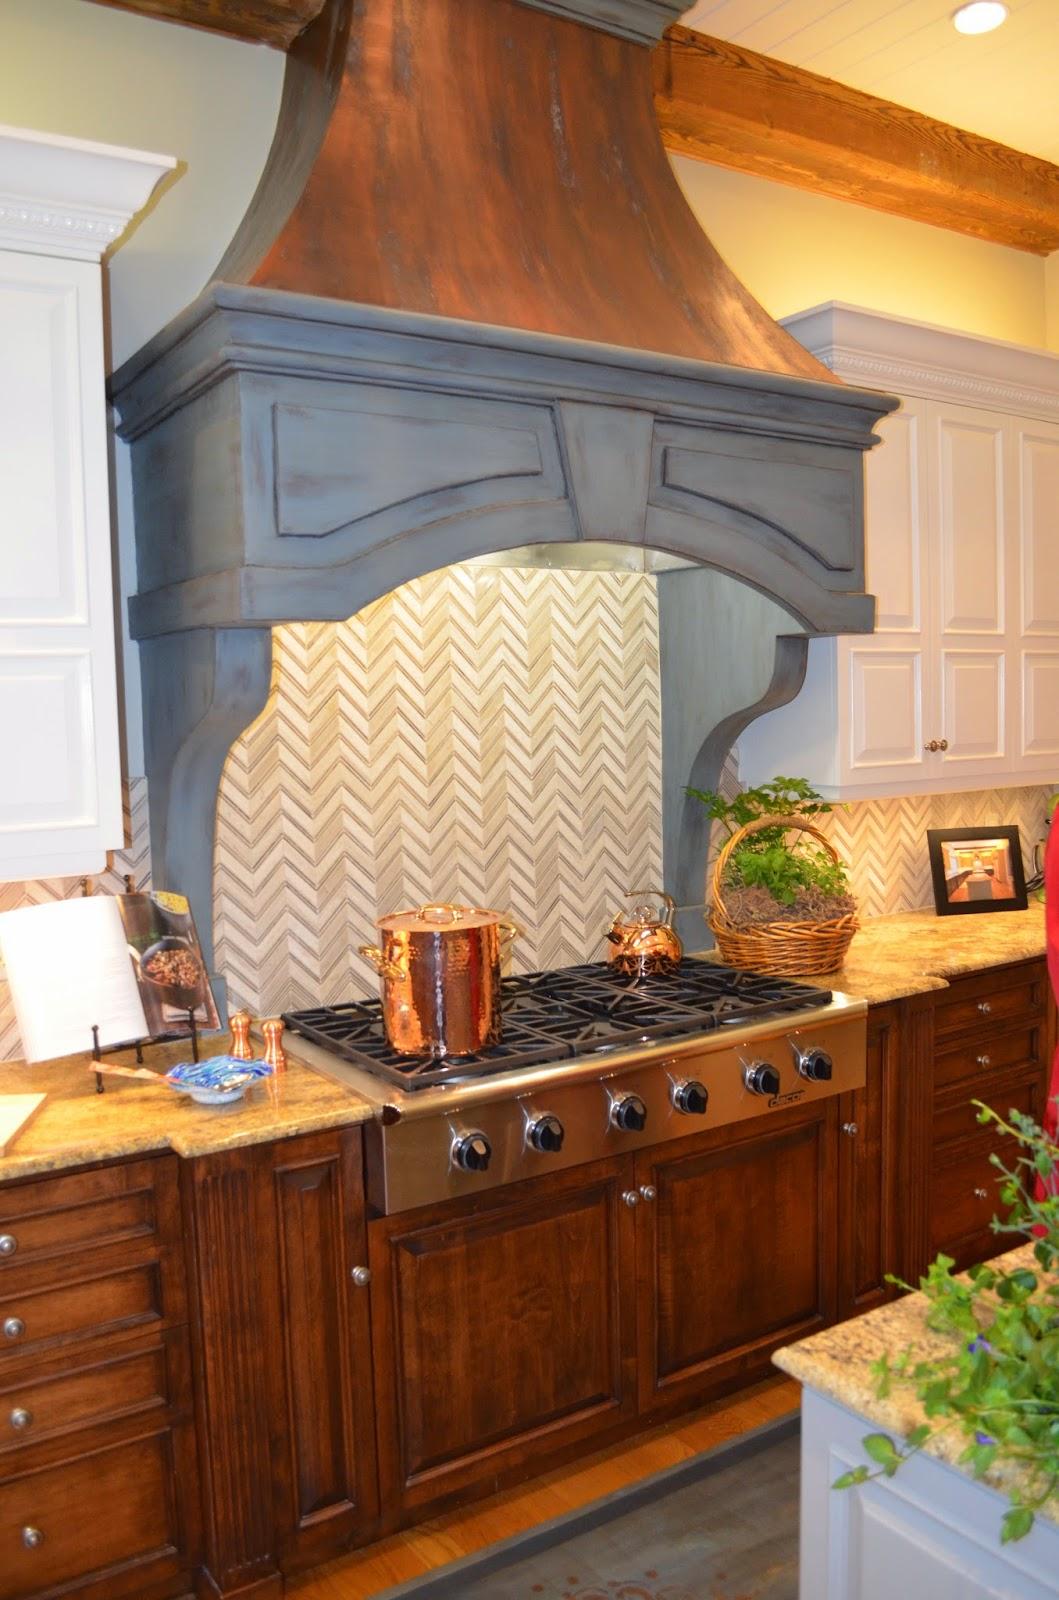 Interior Design Girls Kitchen: Interior Design: Behind The Scenes For The Kitchen At The